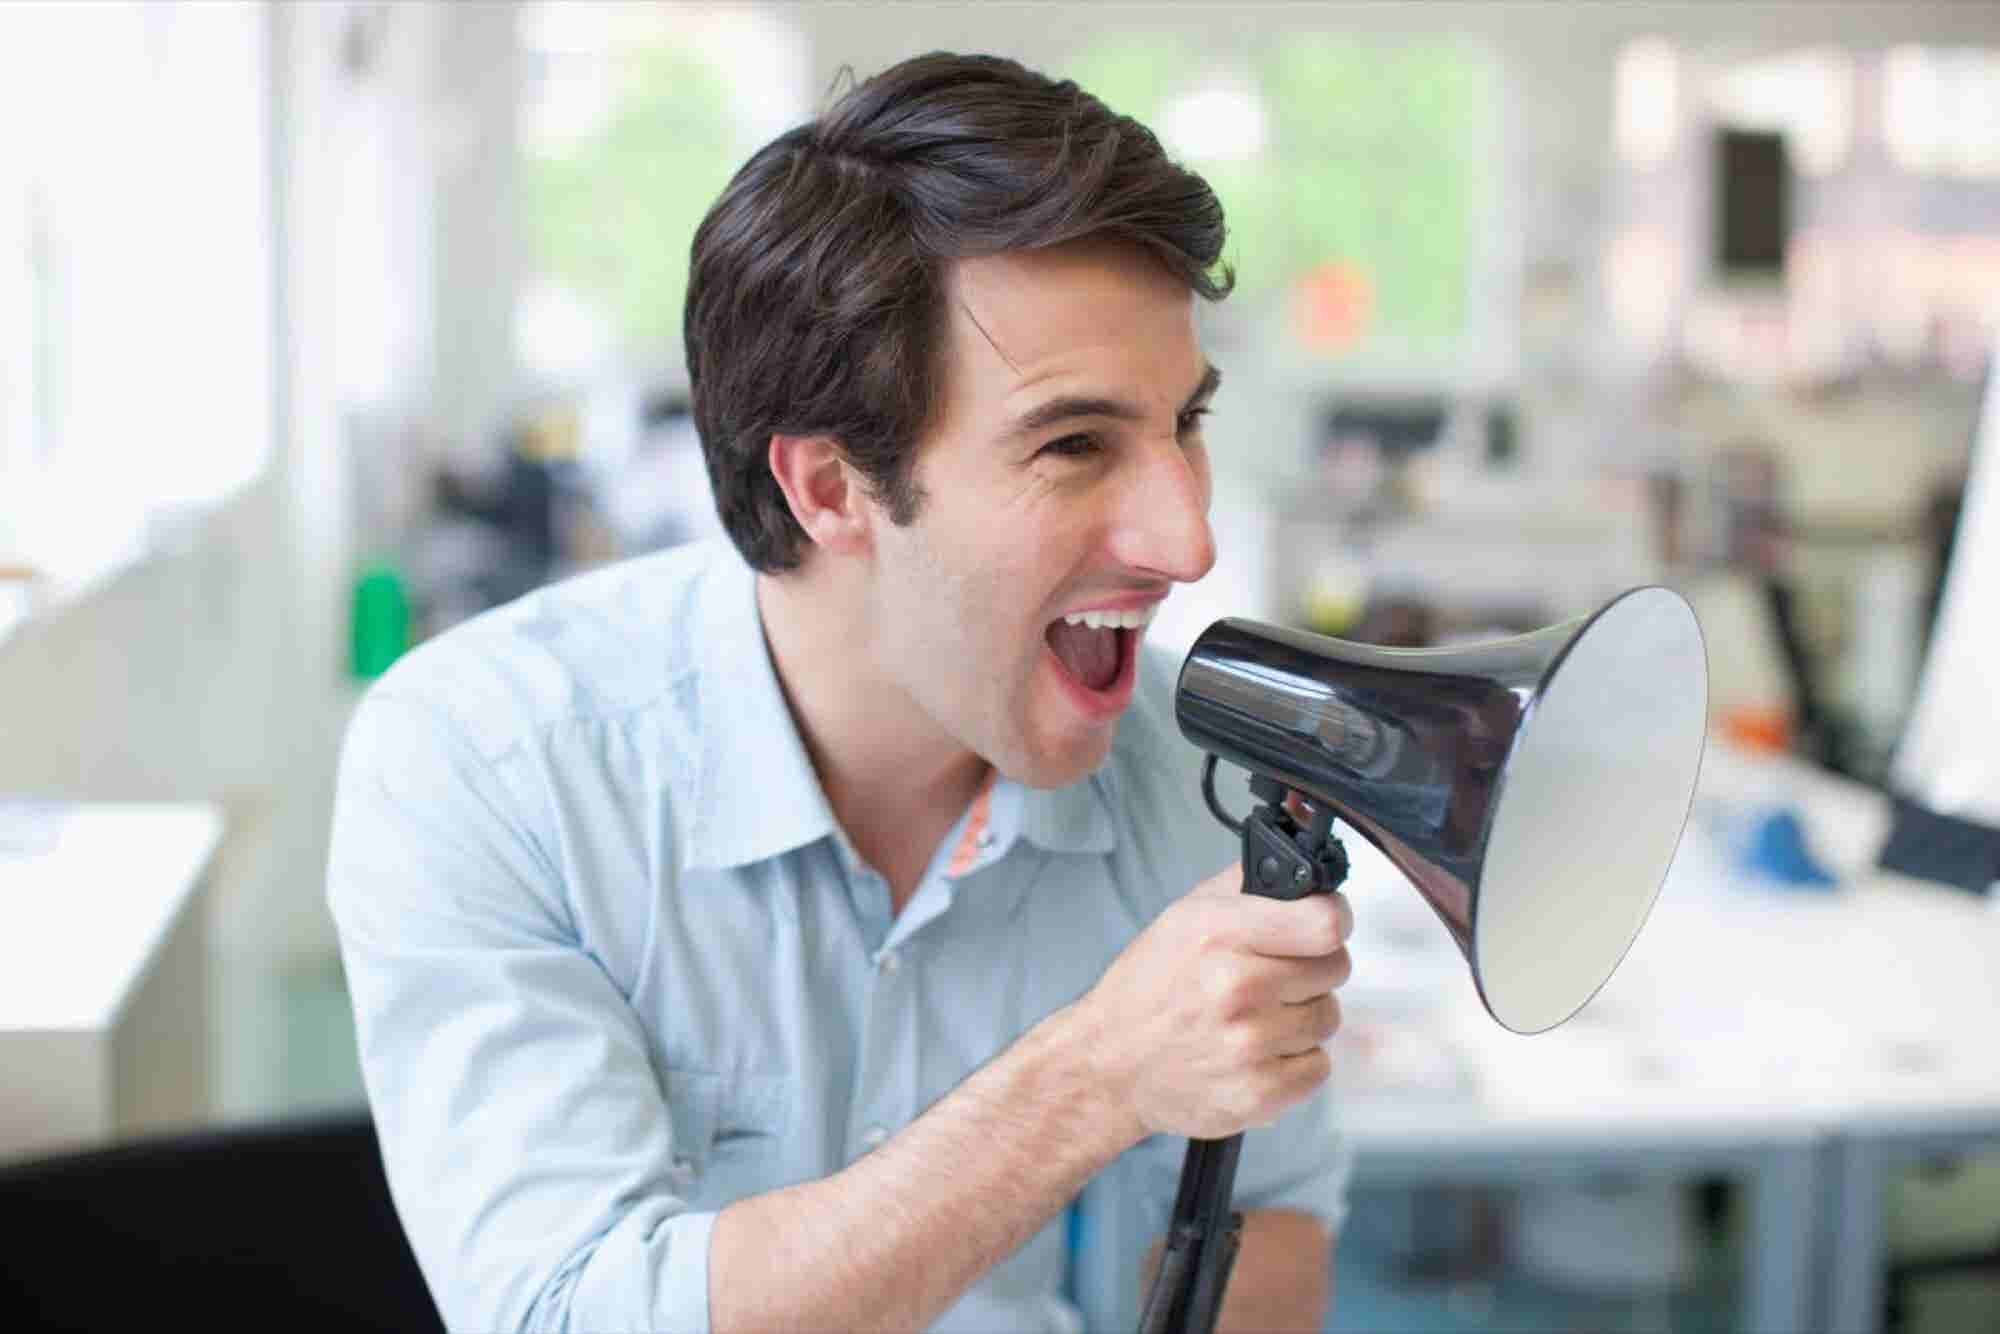 3 Ways to Get Your Voice Heard